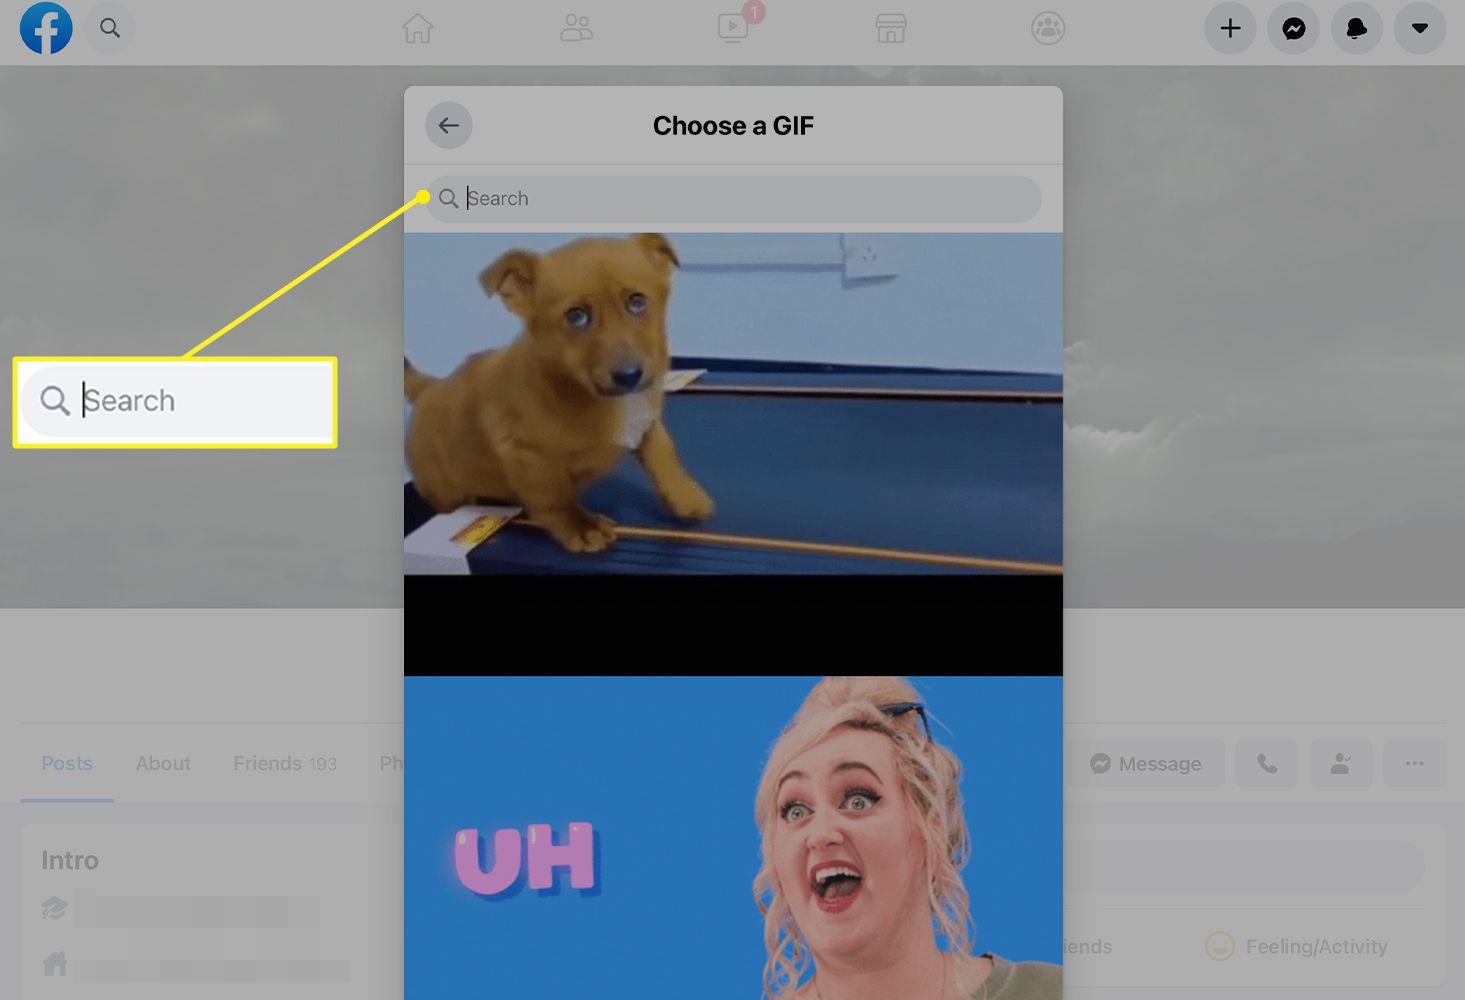 Choose a GIF screen in Facebook